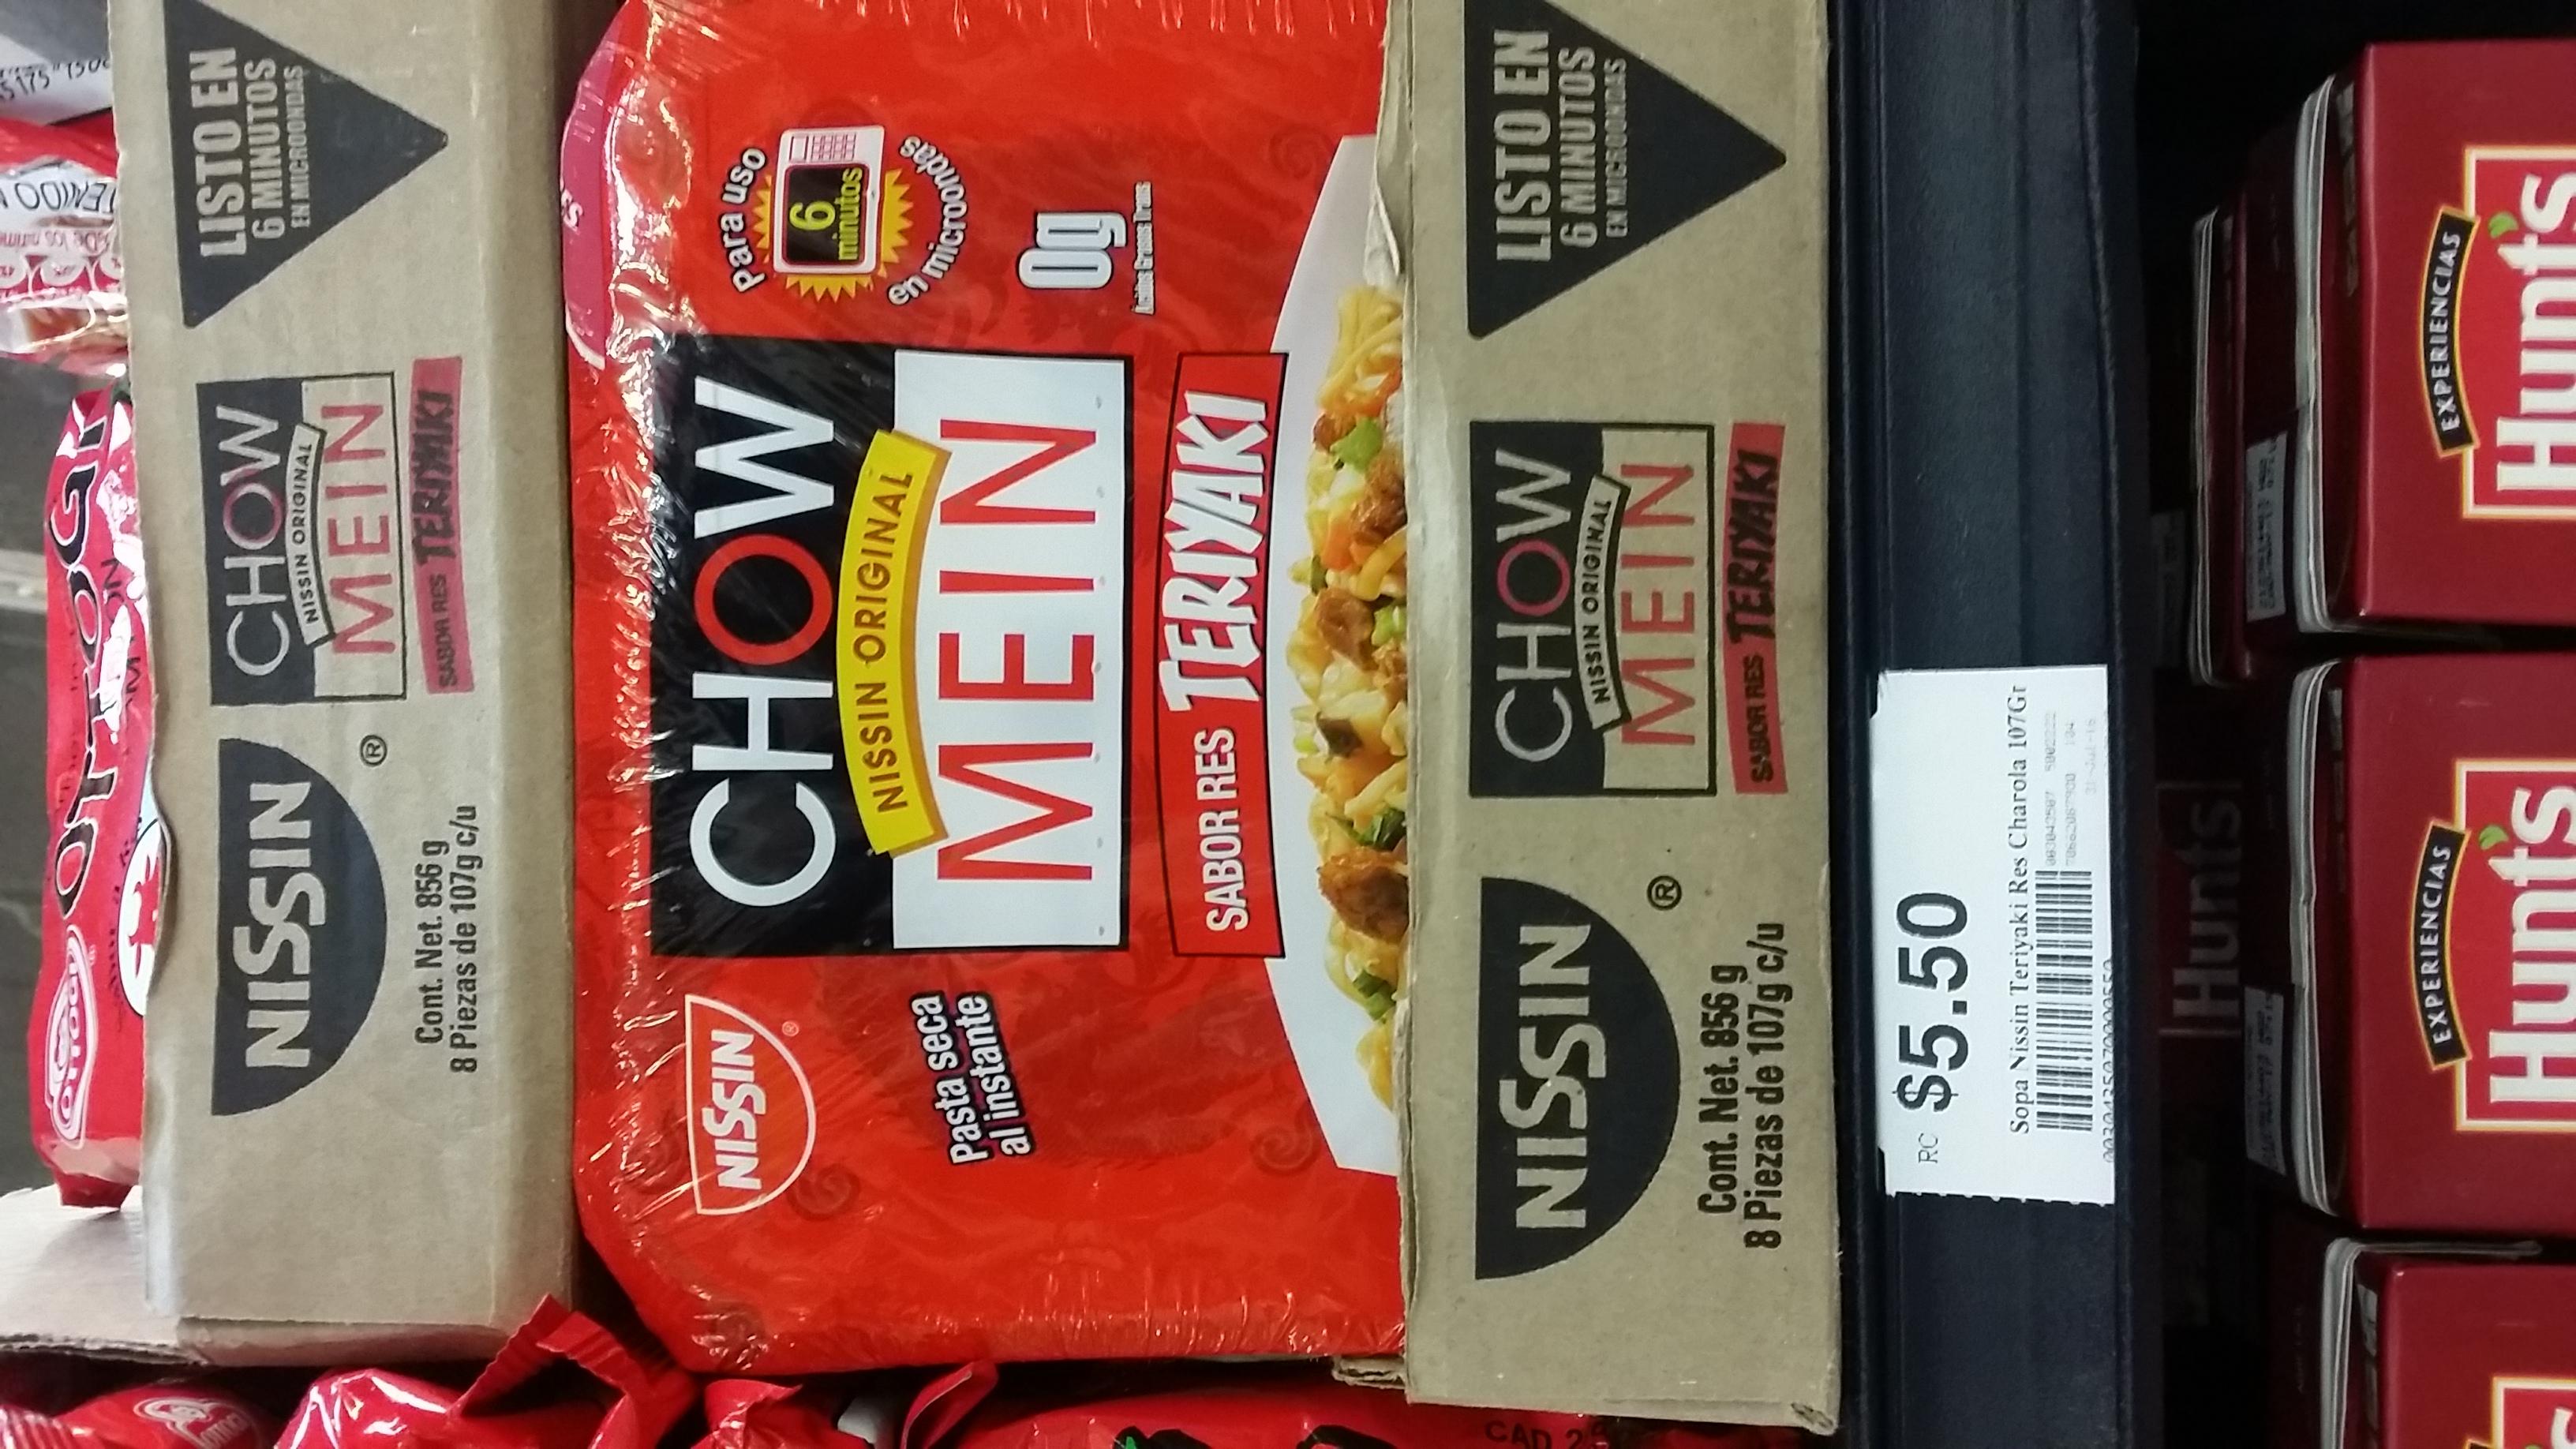 Chedraui Nuevo Veracruz: Chow Mein Nissin a $5.50